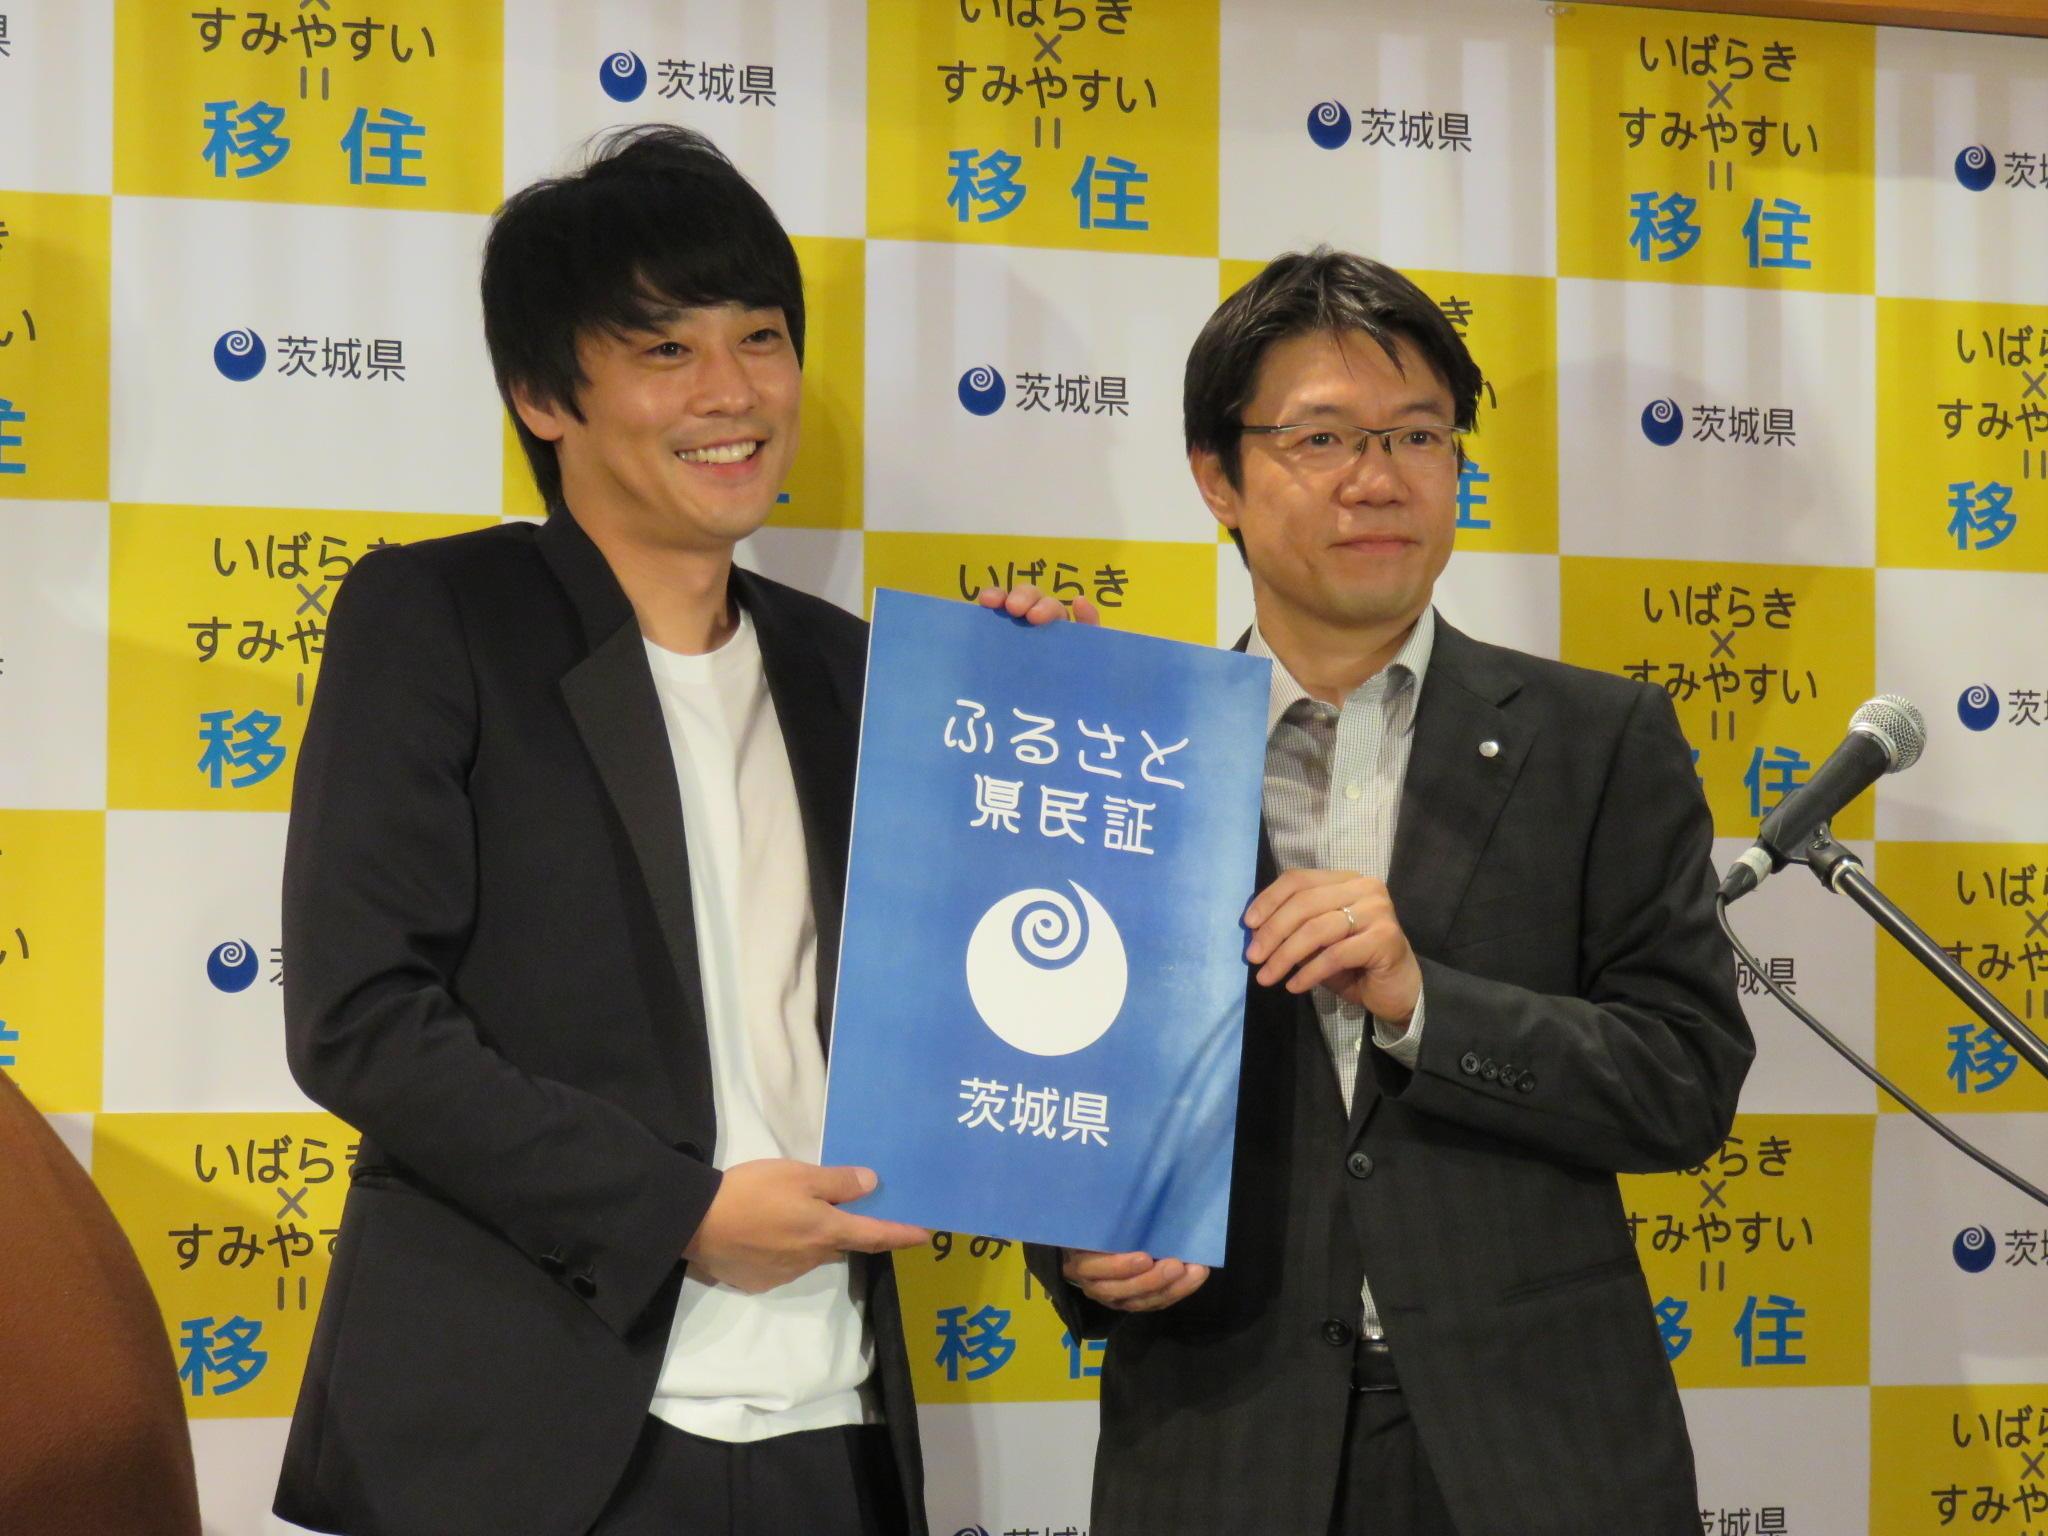 http://news.yoshimoto.co.jp/20160630165302-f4b293c2333b5b41132d5db5058c4e1a7fa6b83b.jpg